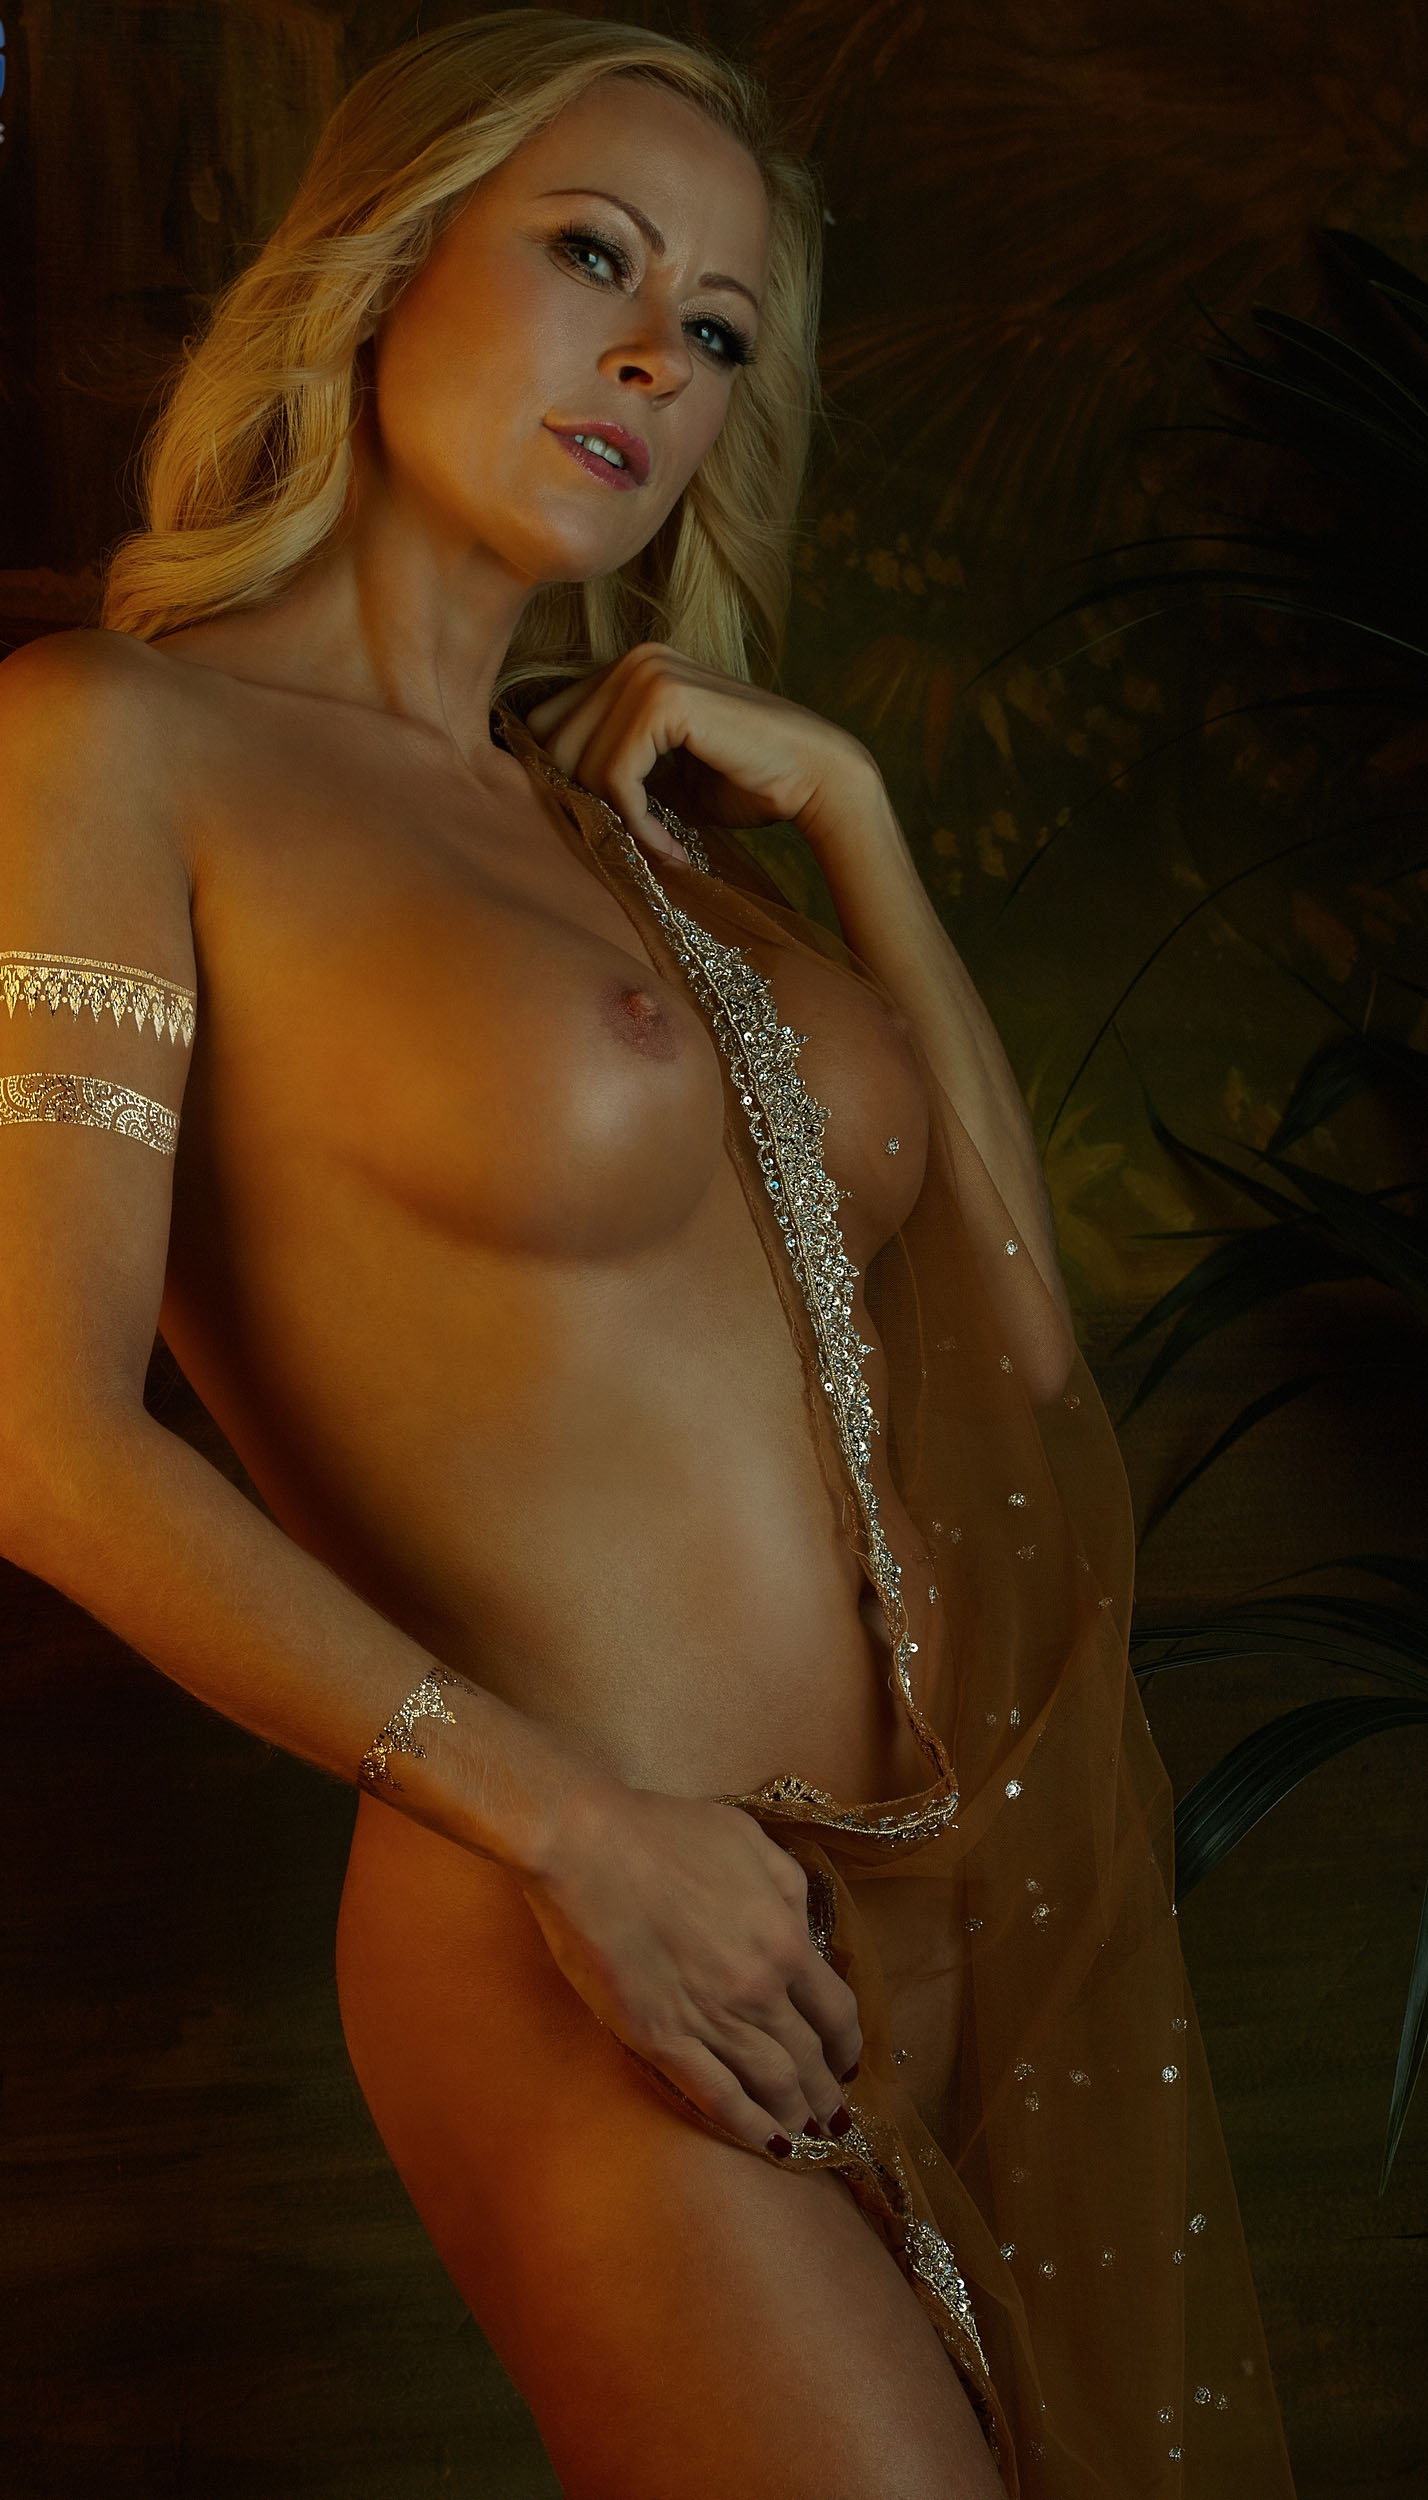 Дженни Элверс голая. Фото - 24